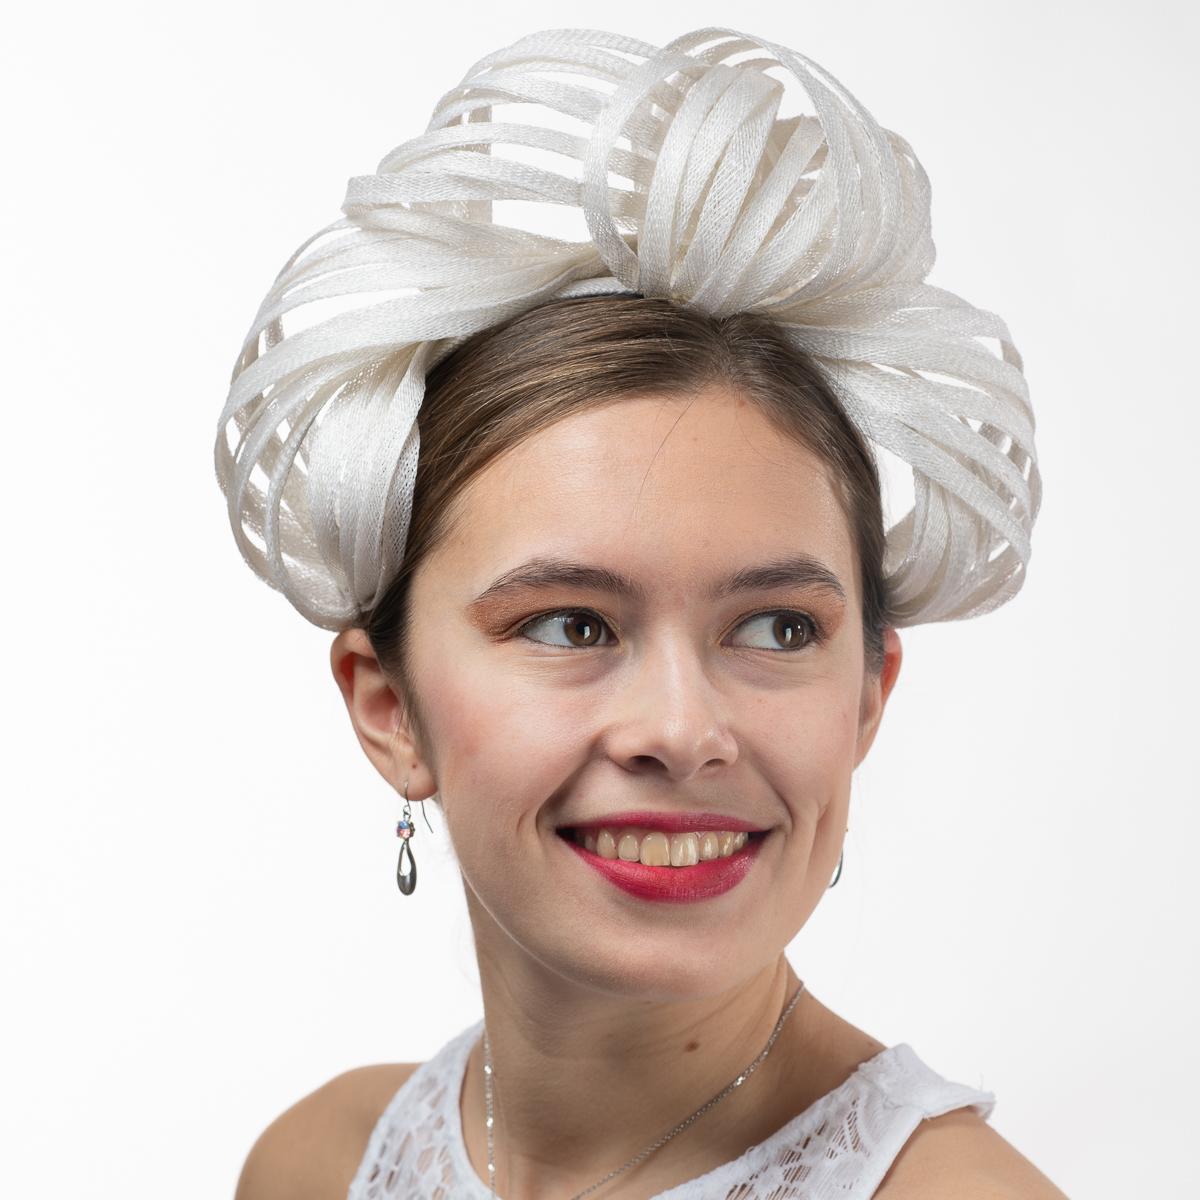 595198c62 Princess Leia Sinamay Headband Fascinator Cocktail Hats-102054- Sun ...